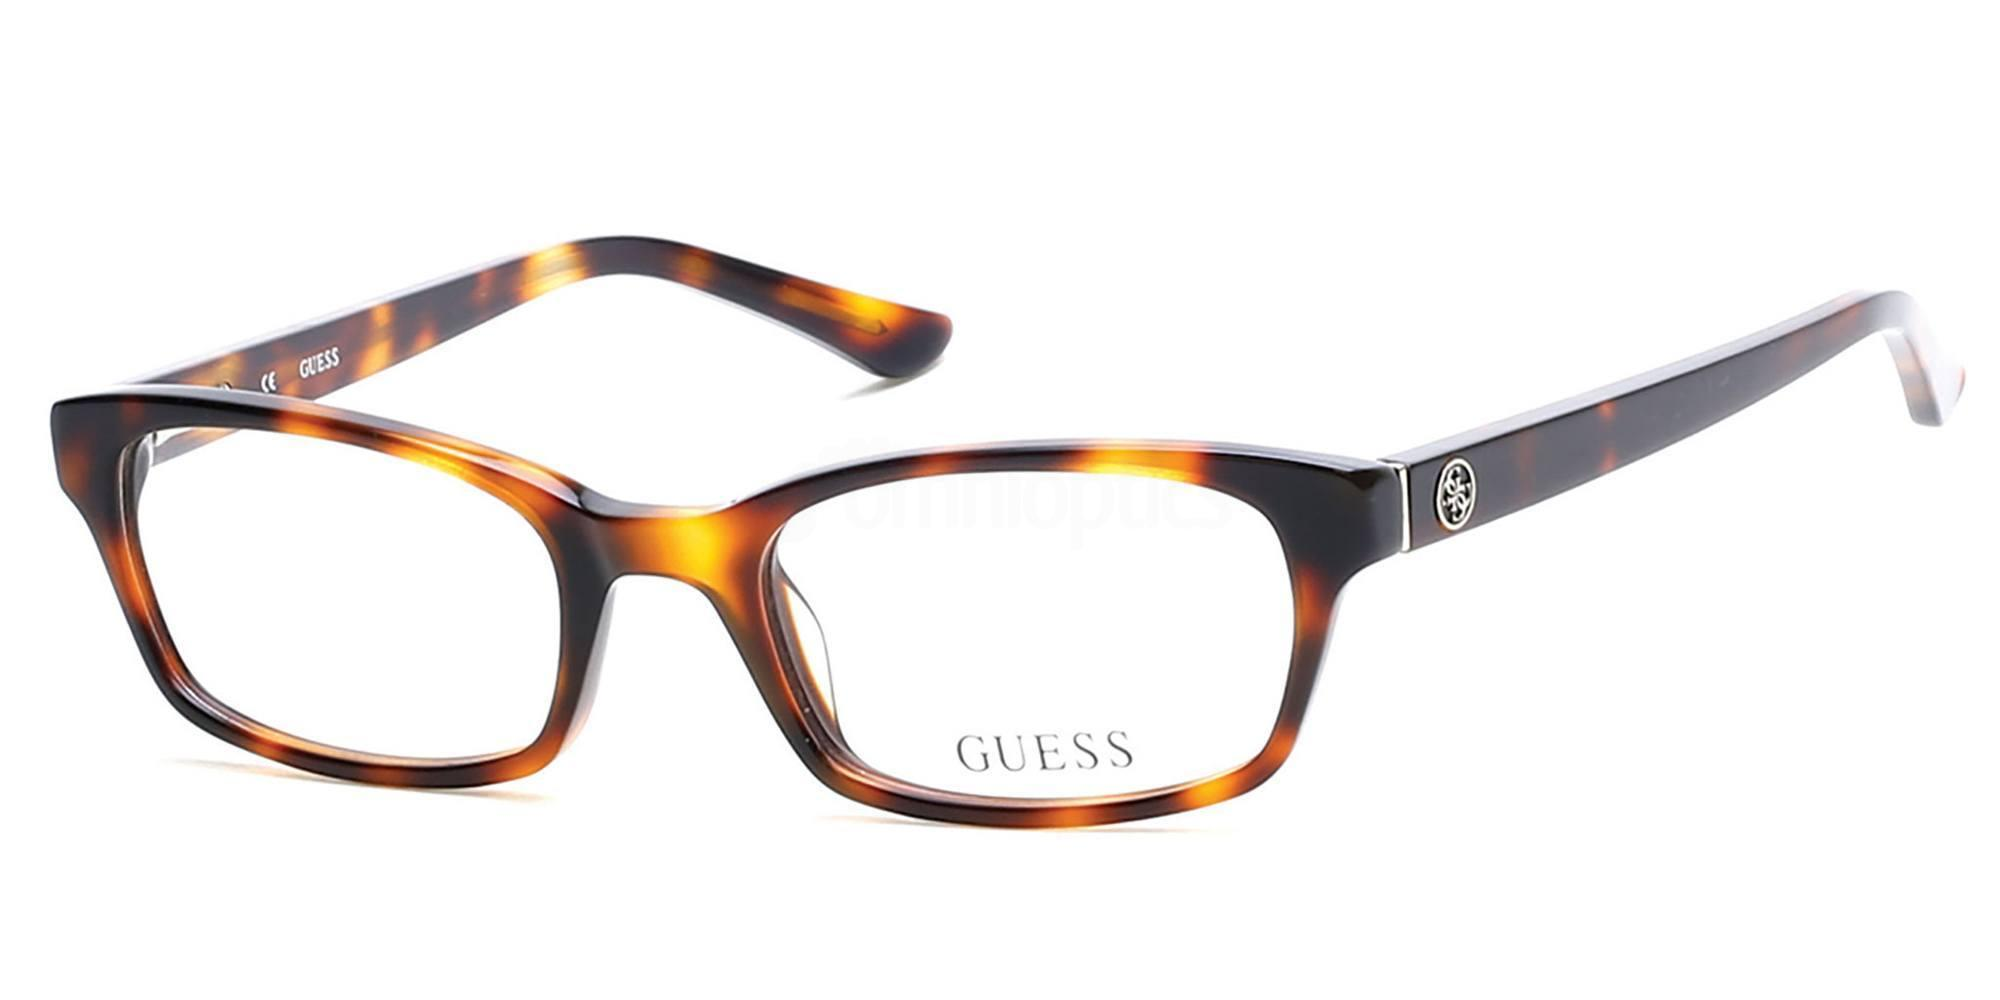 066 GU2535 , Guess